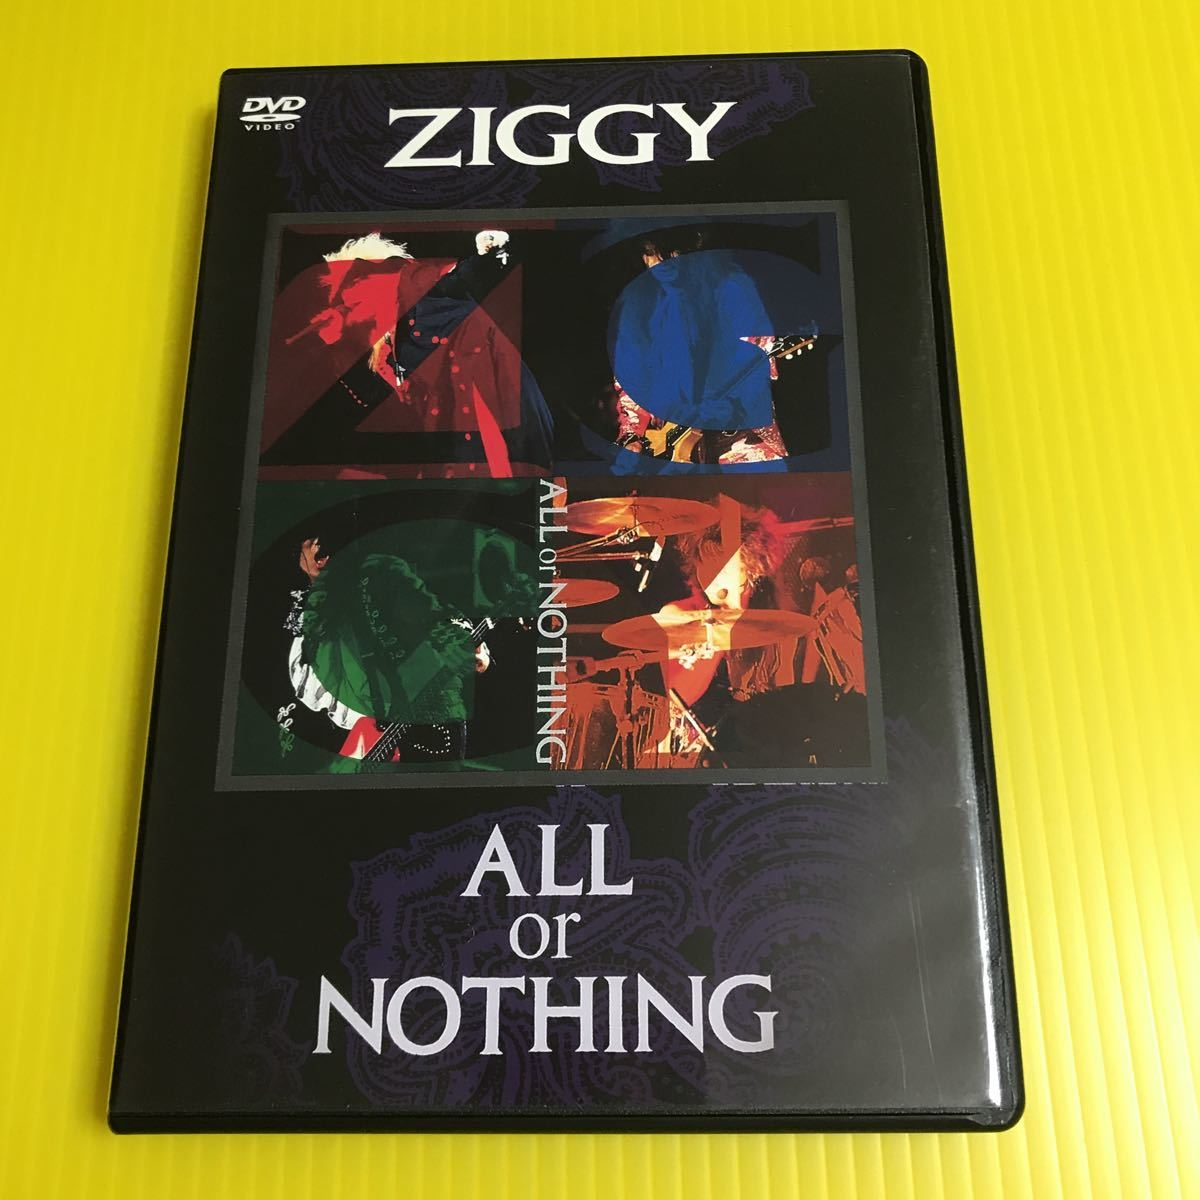 DVD   ZIGGY ALL or NOTHING  ジギー 1990.11.1国立代々木競技場第一体育館LIVE 再生確認済